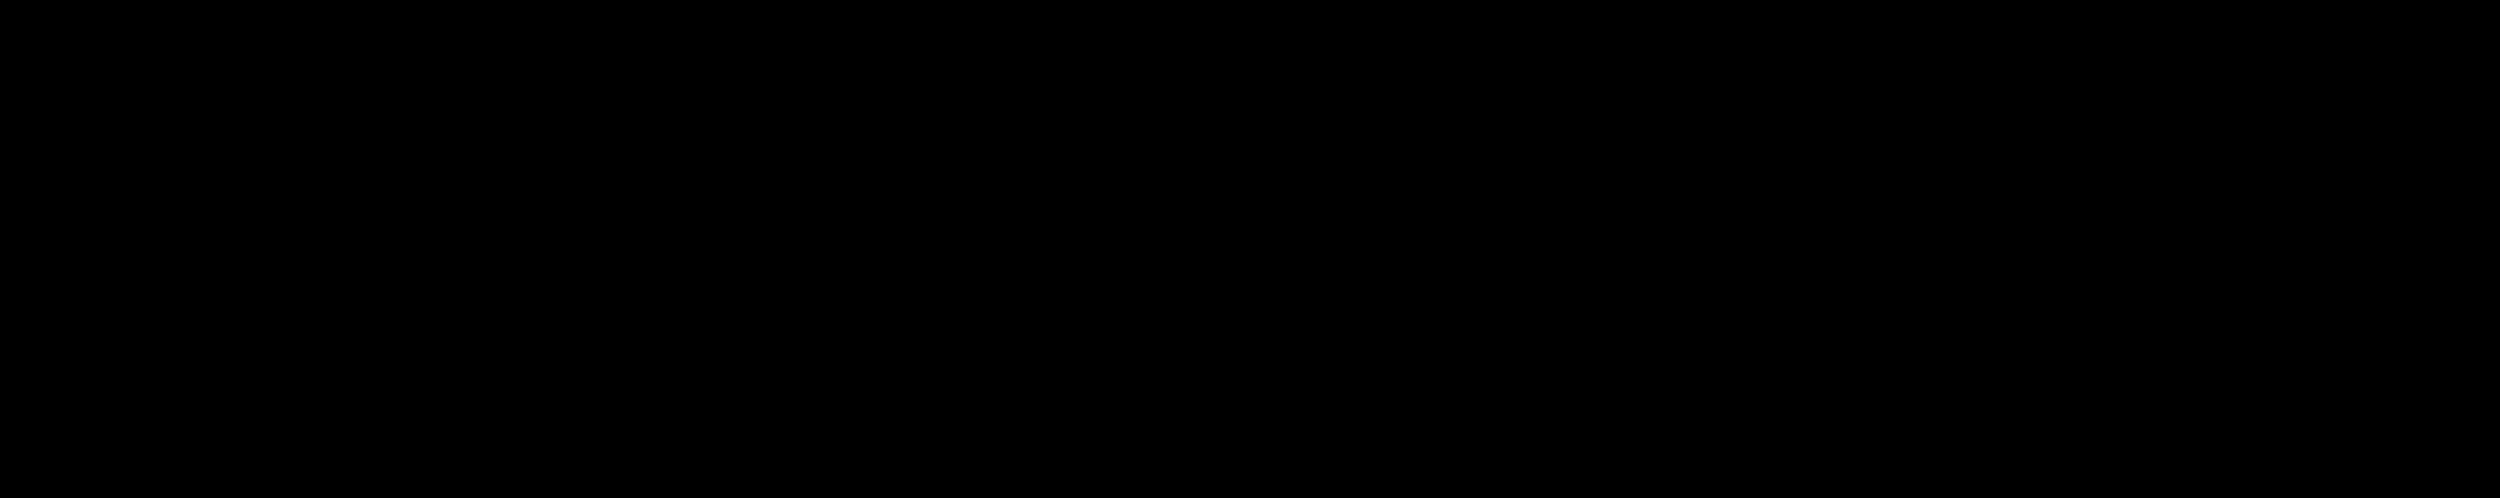 bianchi-logo copy.png